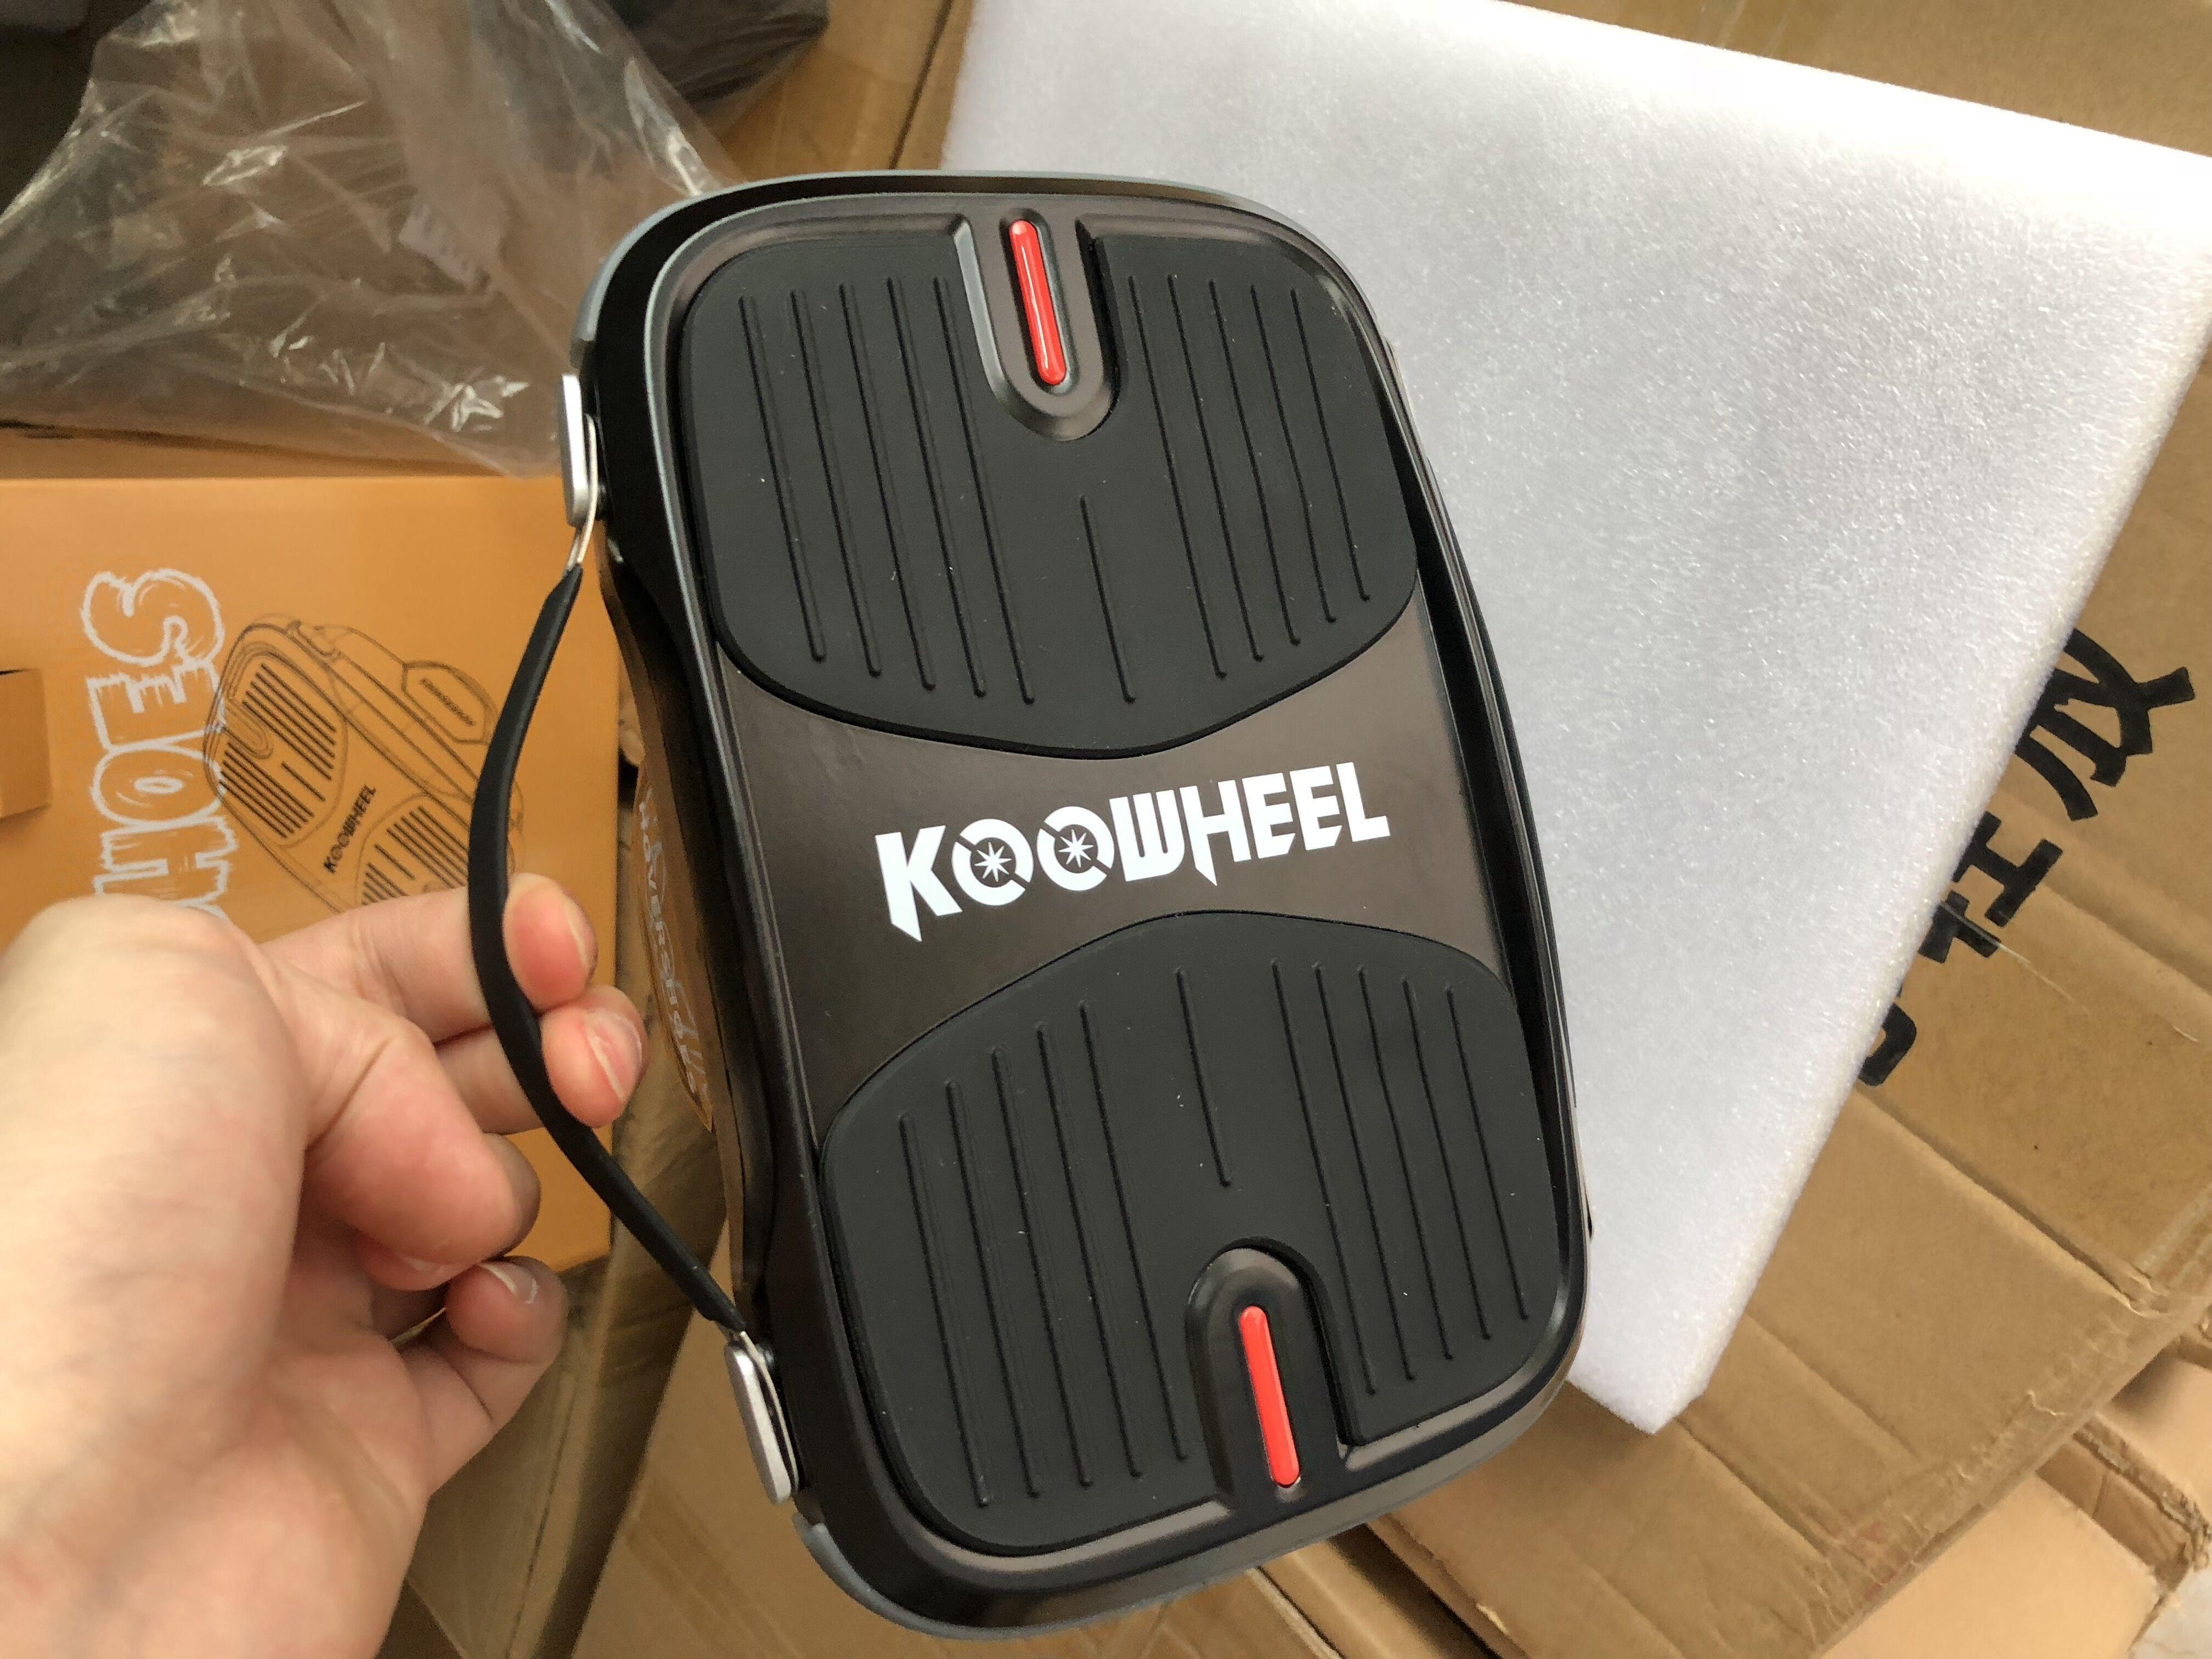 2018 Newest Koowheel Hovershoes 35 Inch Solid Rubber Tire E Wheel Coilless Fm Transmitter Skateboard In Stock For Wholesale Koowwheel